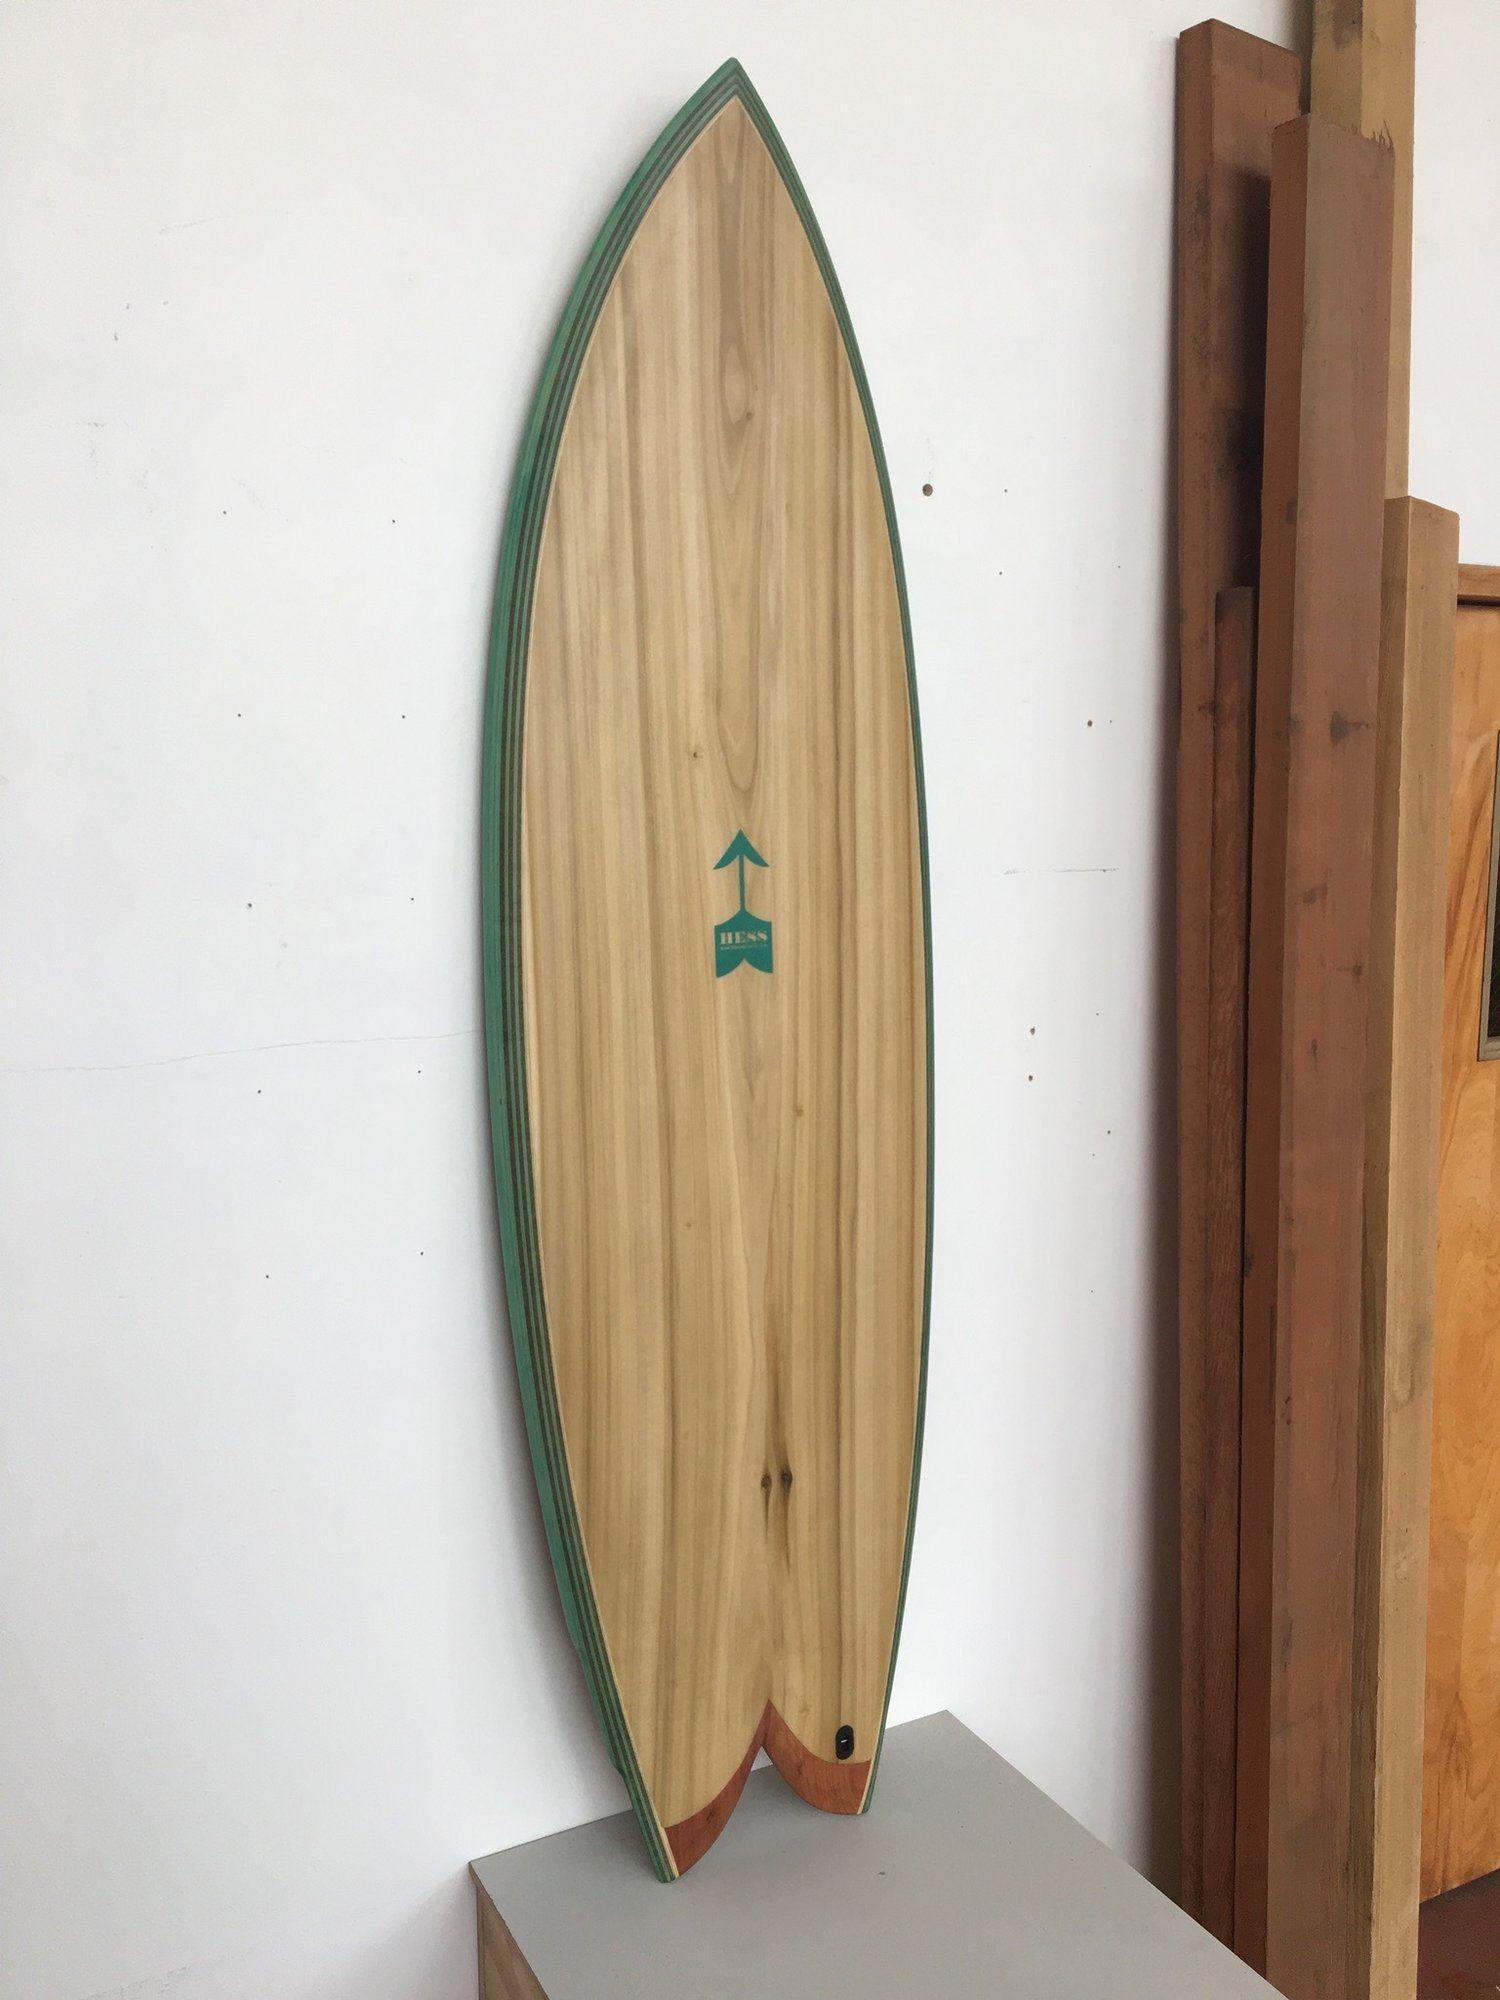 Boards For Sale Hess Surfboards Surf In 2019 Surfboard